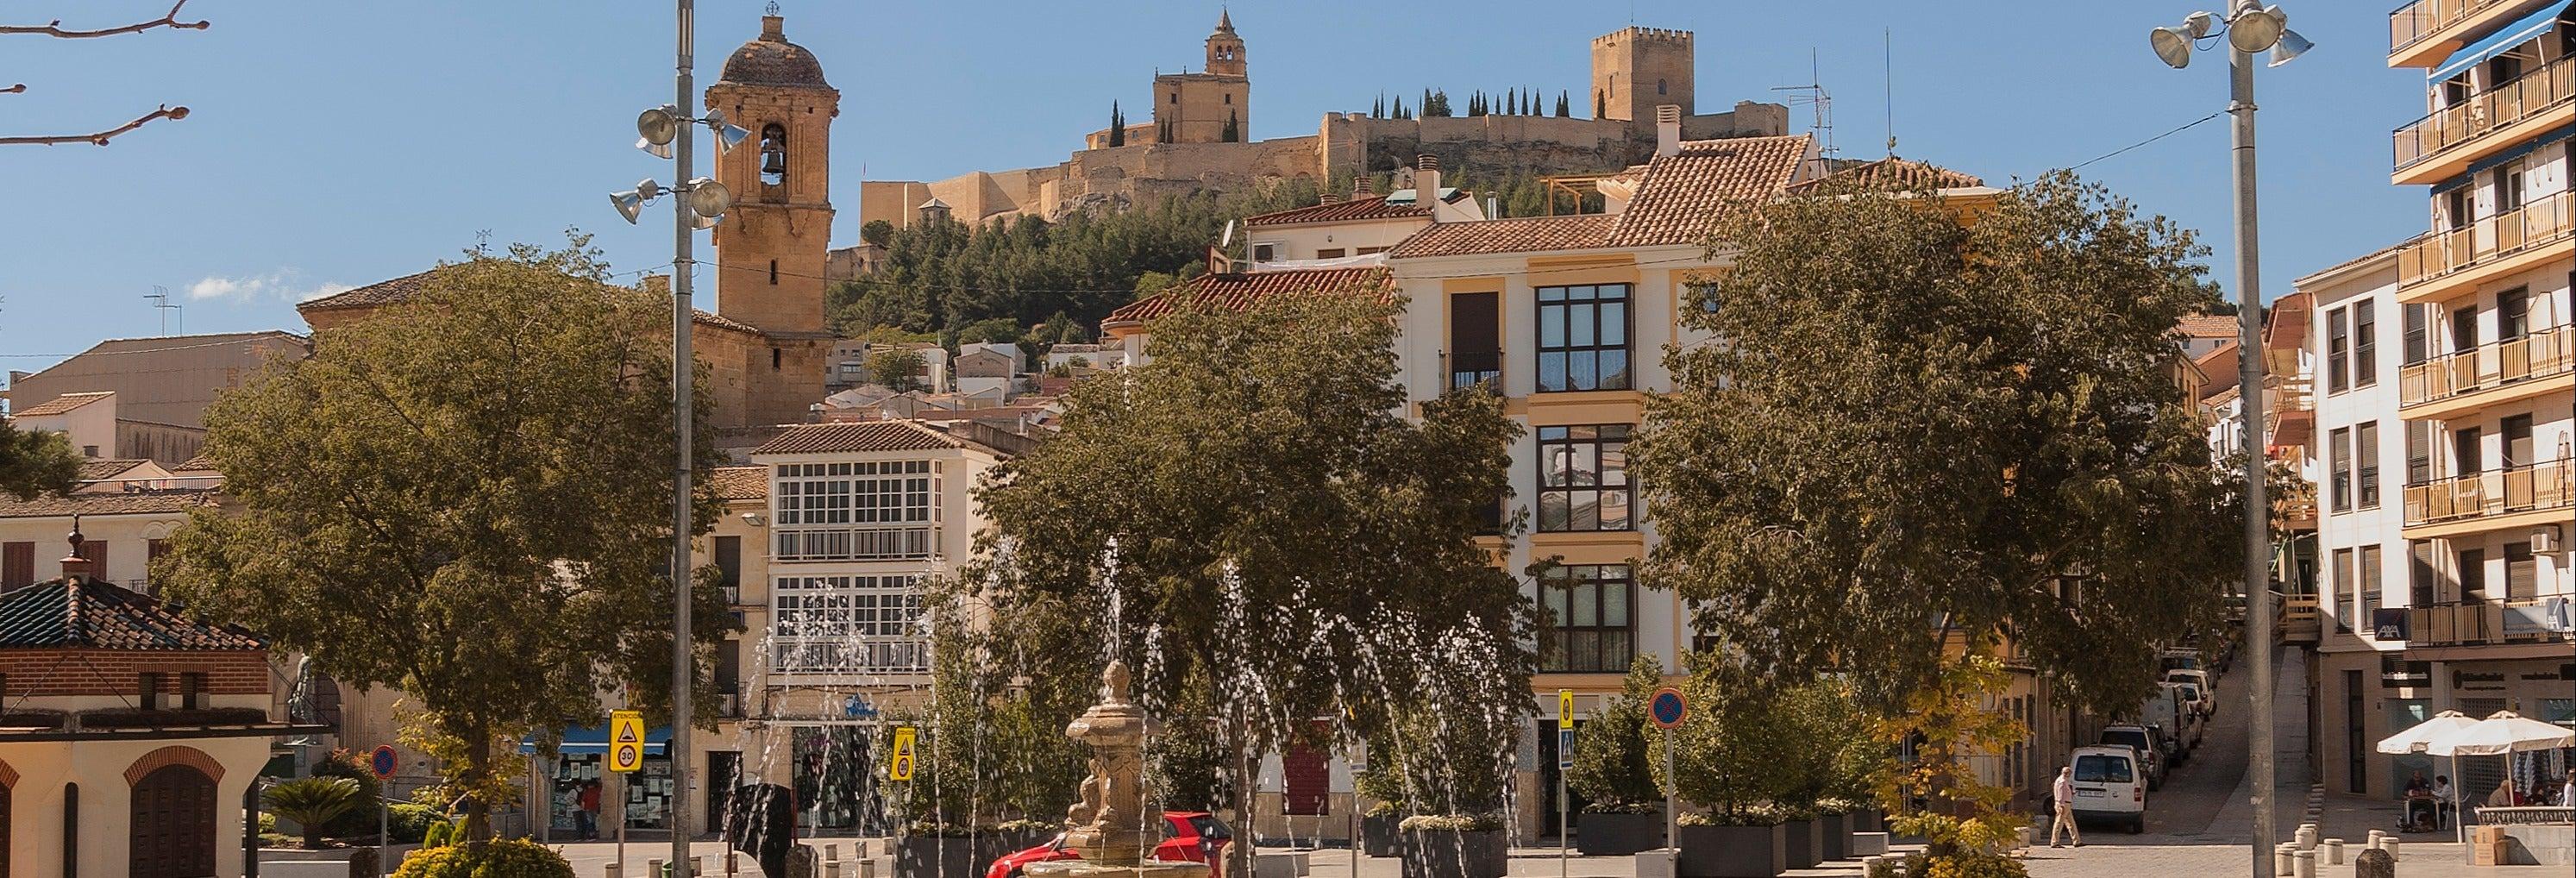 Tour privado por Alcalá la Real ¡Tú eliges!